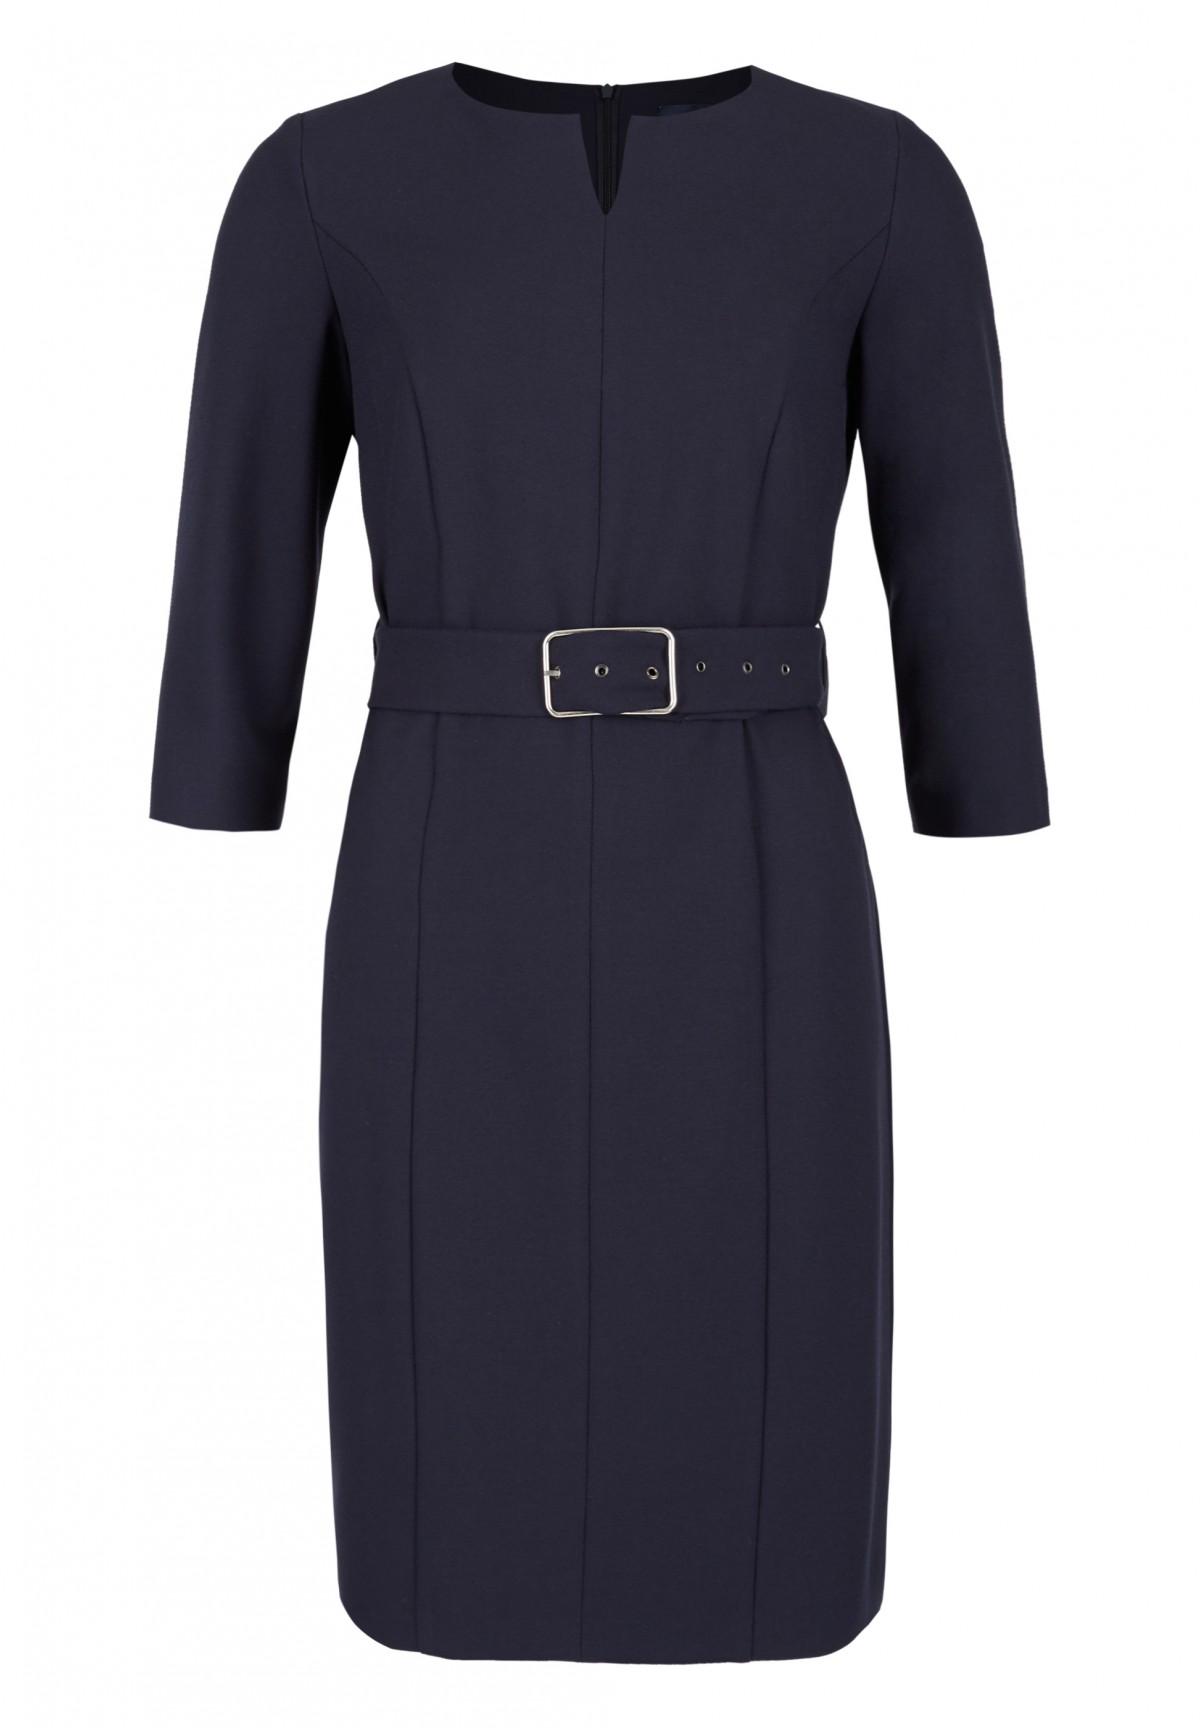 Elegantes Kleid mit Taillengürtel / Elegantes Kleid mit Taillengürtel